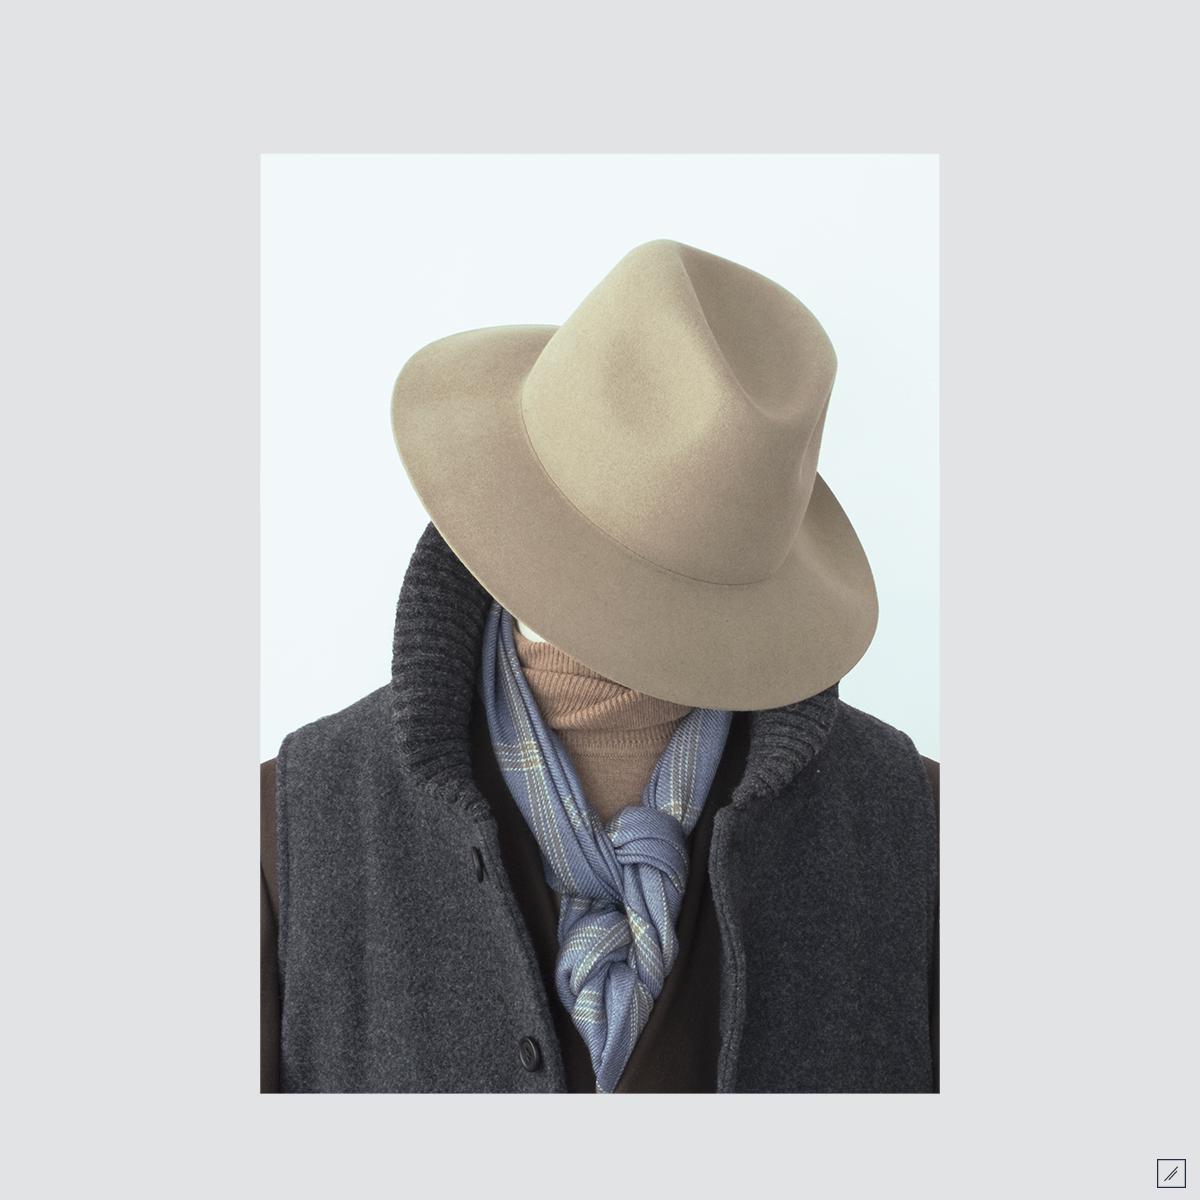 la-stoffa :     tan & indigo    Hat - Rabbit felt rollable     Woven scarf - Double windowpane